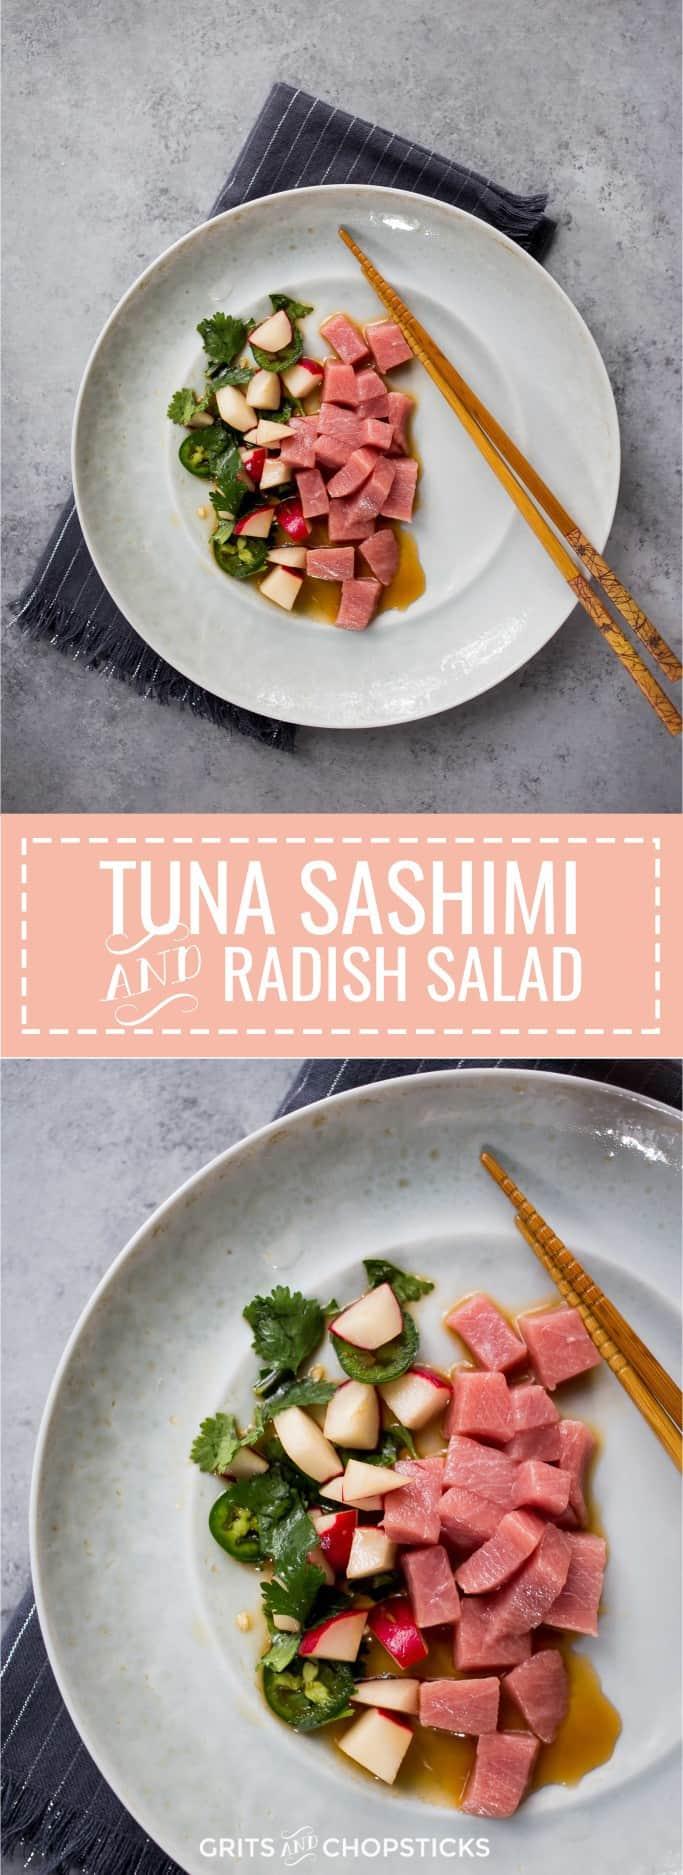 Tuna sashimi with radish salad flavored with homemade ponzu dressing, cilantro, scallions and jalapeno